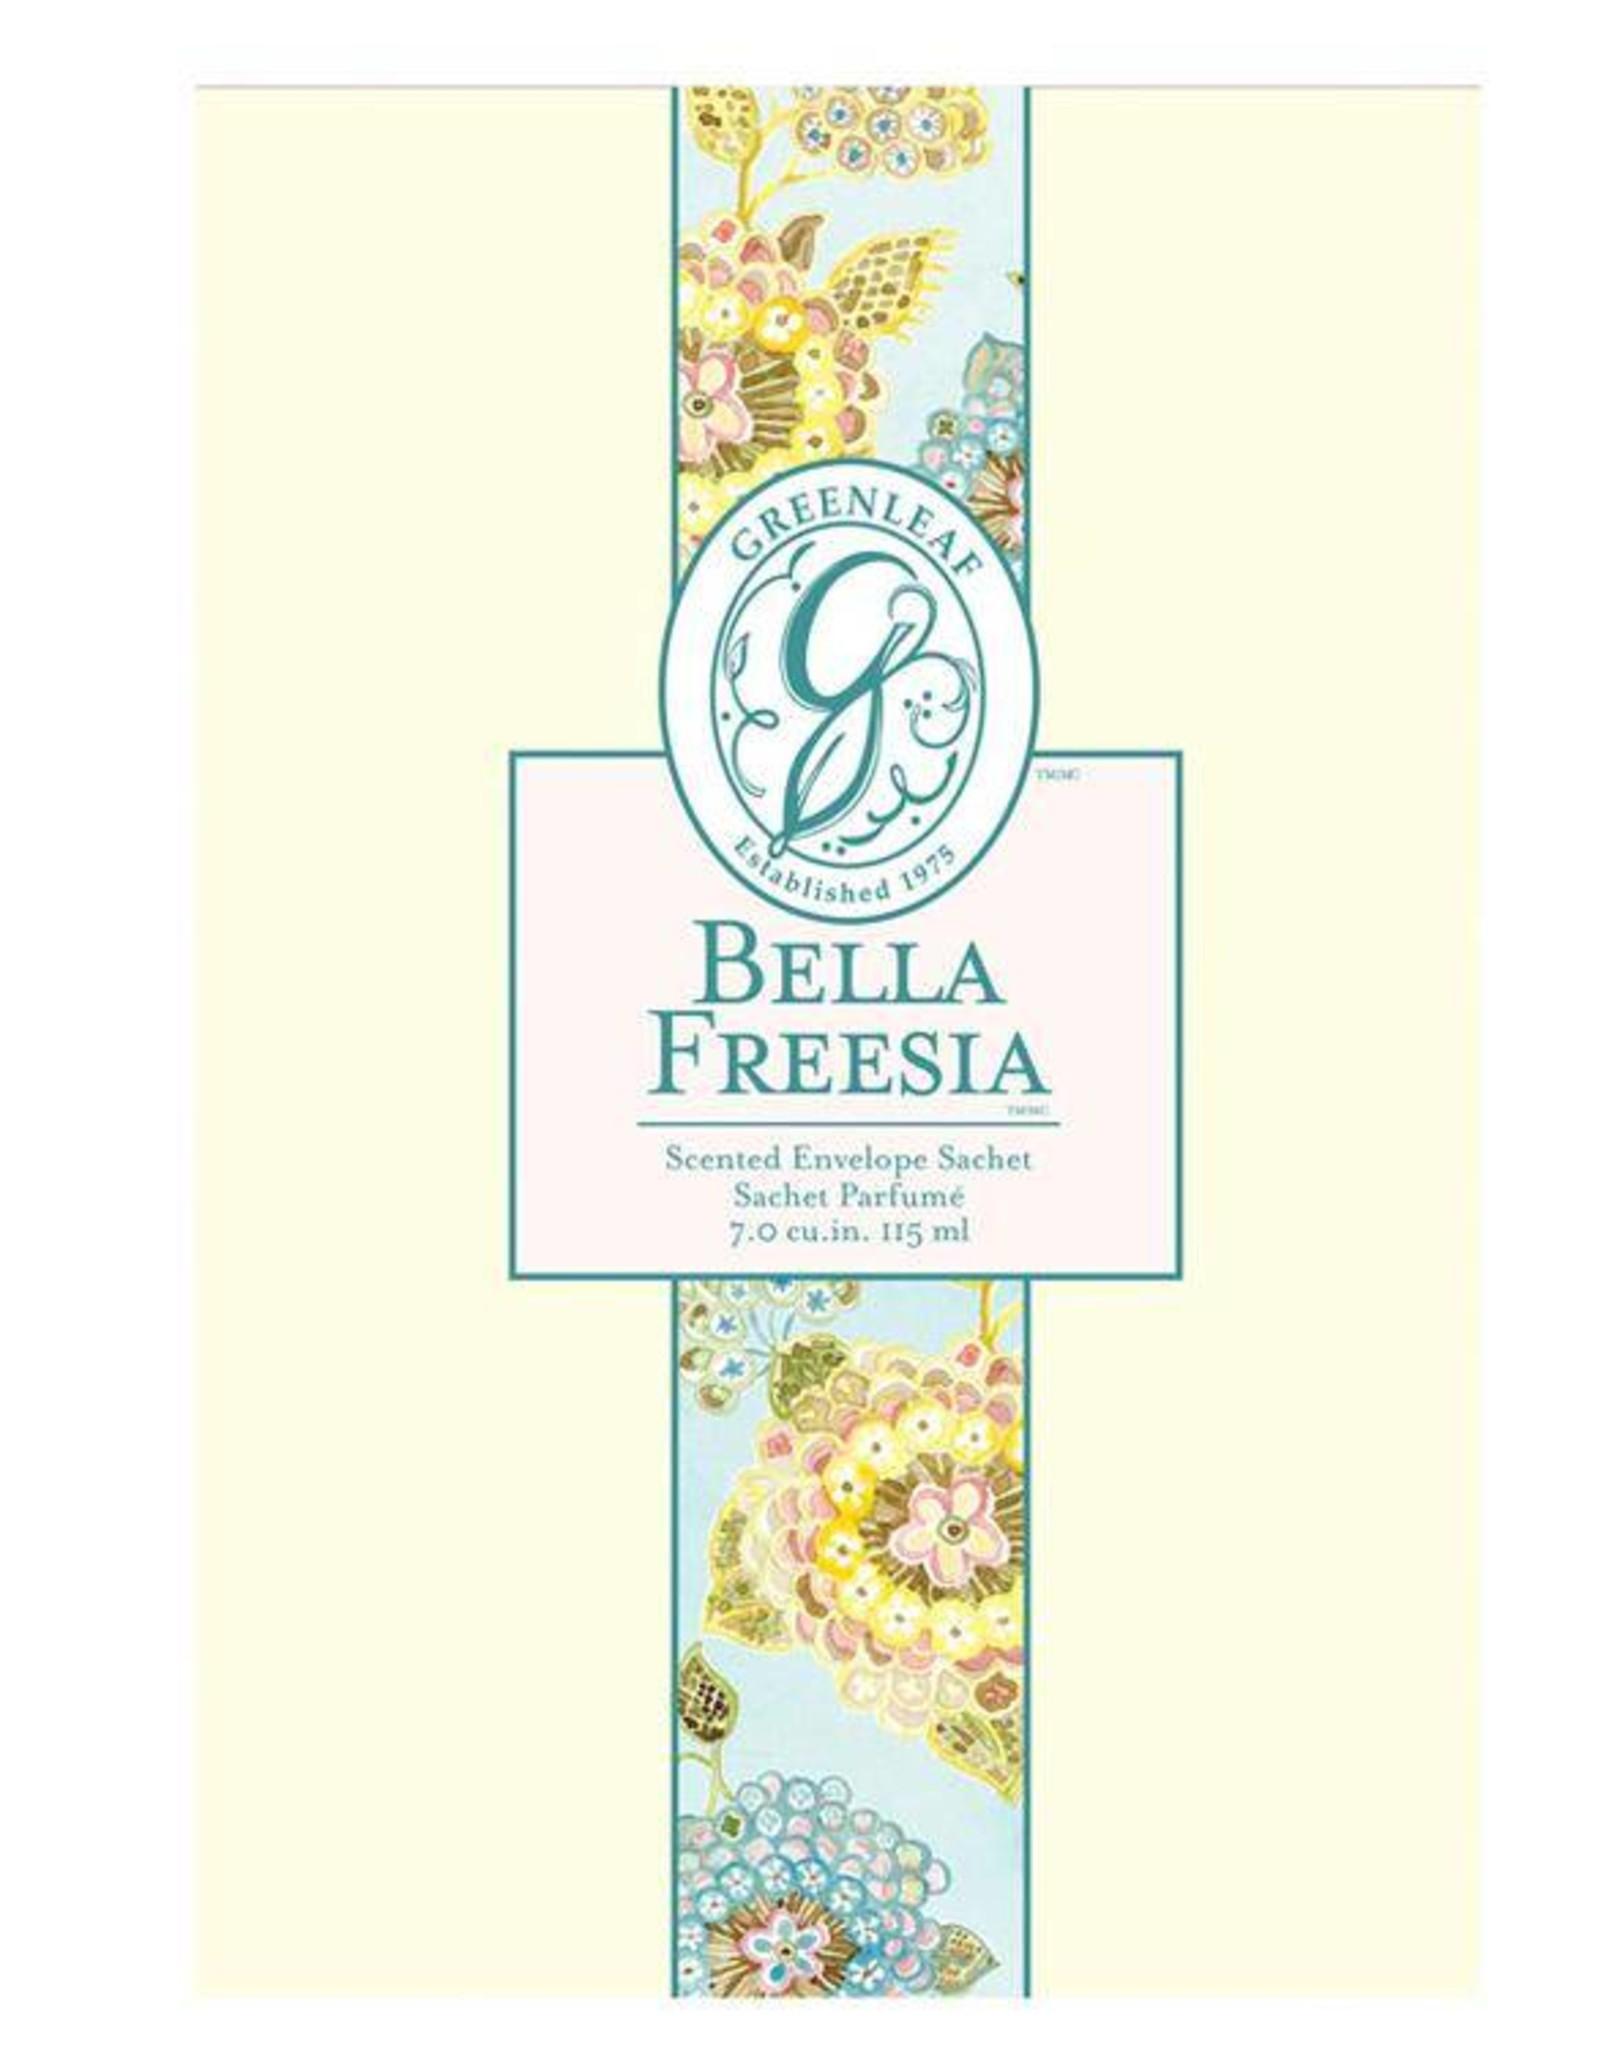 greenleaf Bella Freesia Large Sachet